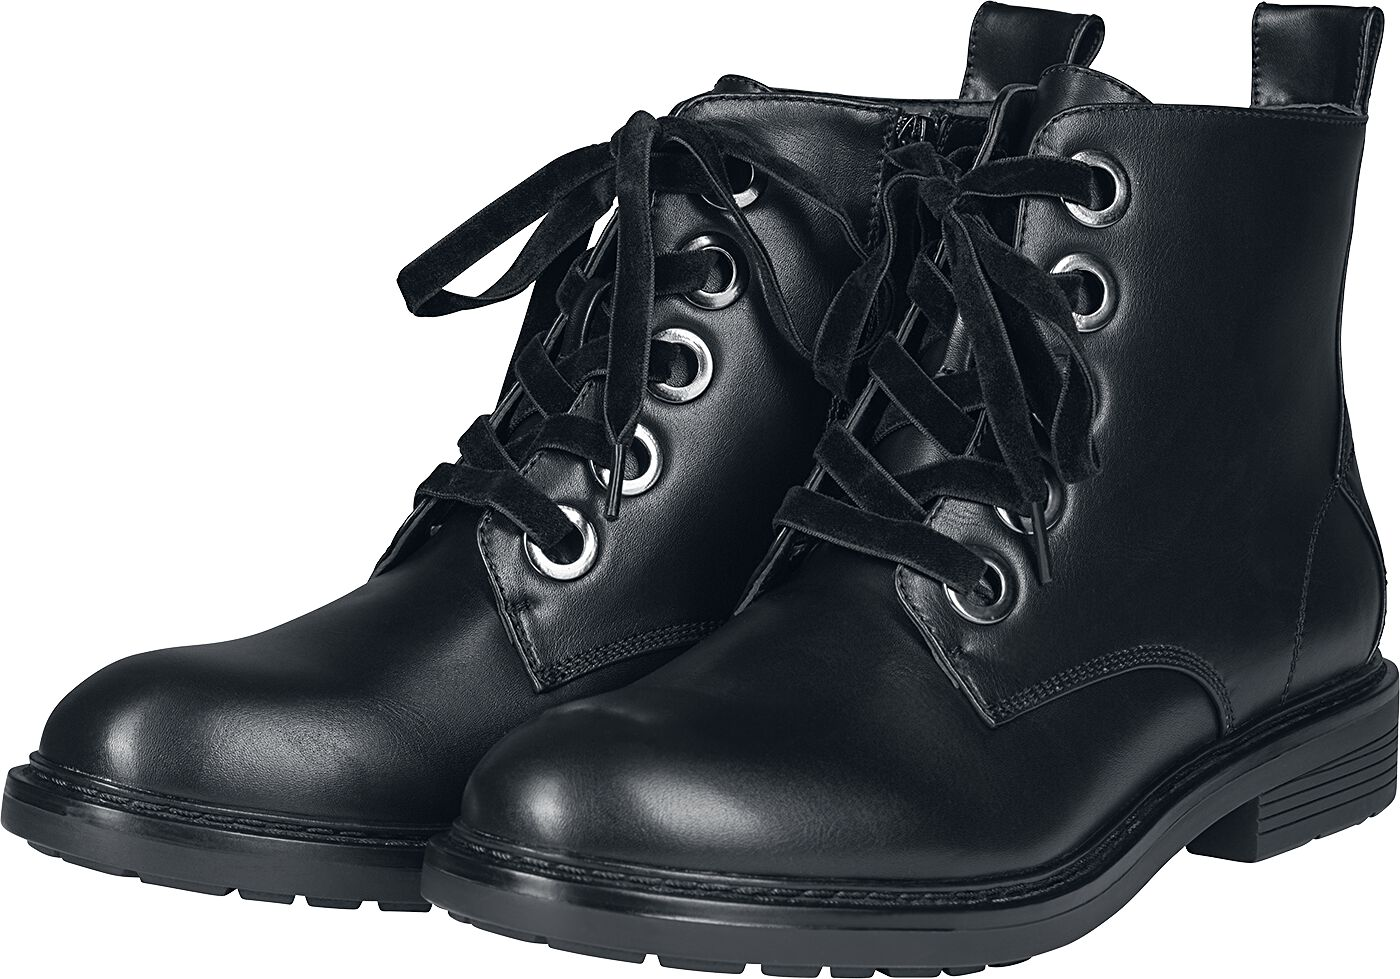 Stiefel - Urban Classics Velvet Lace Boot Boot schwarz  - Onlineshop EMP